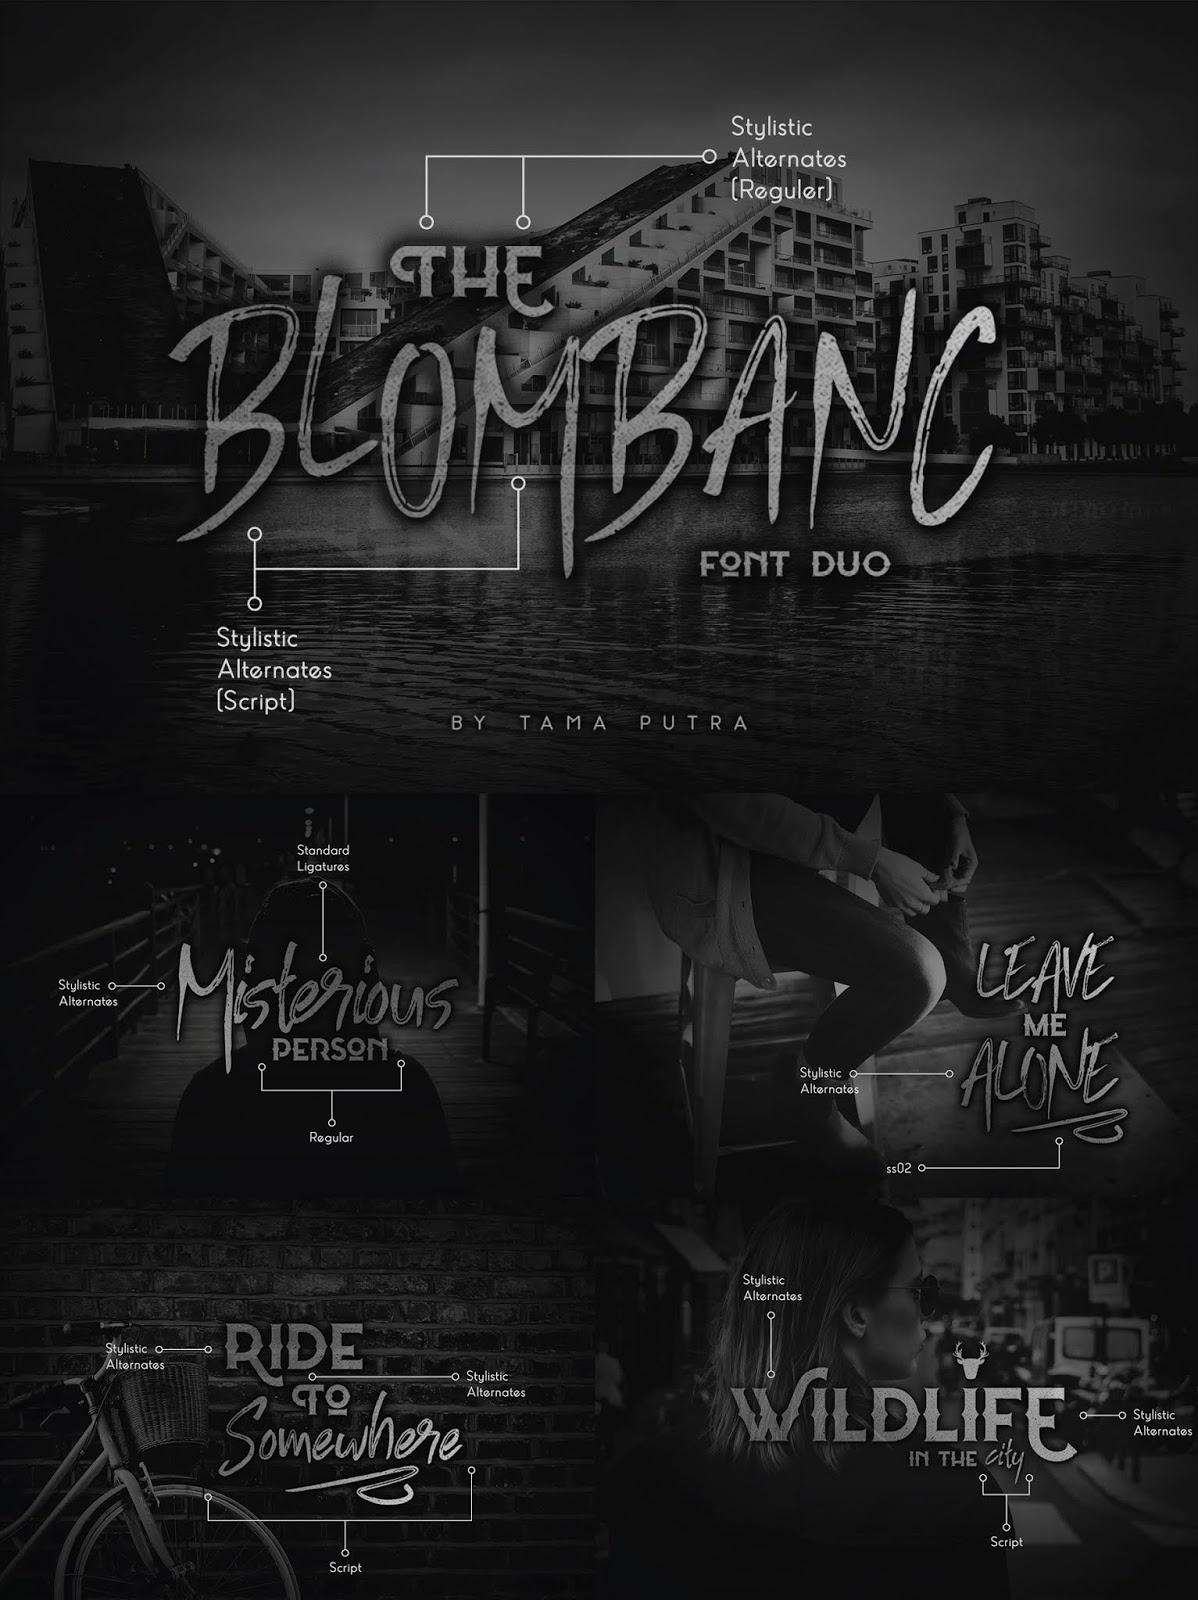 font, typeface, blombanc, display, handwritten, script, font duo